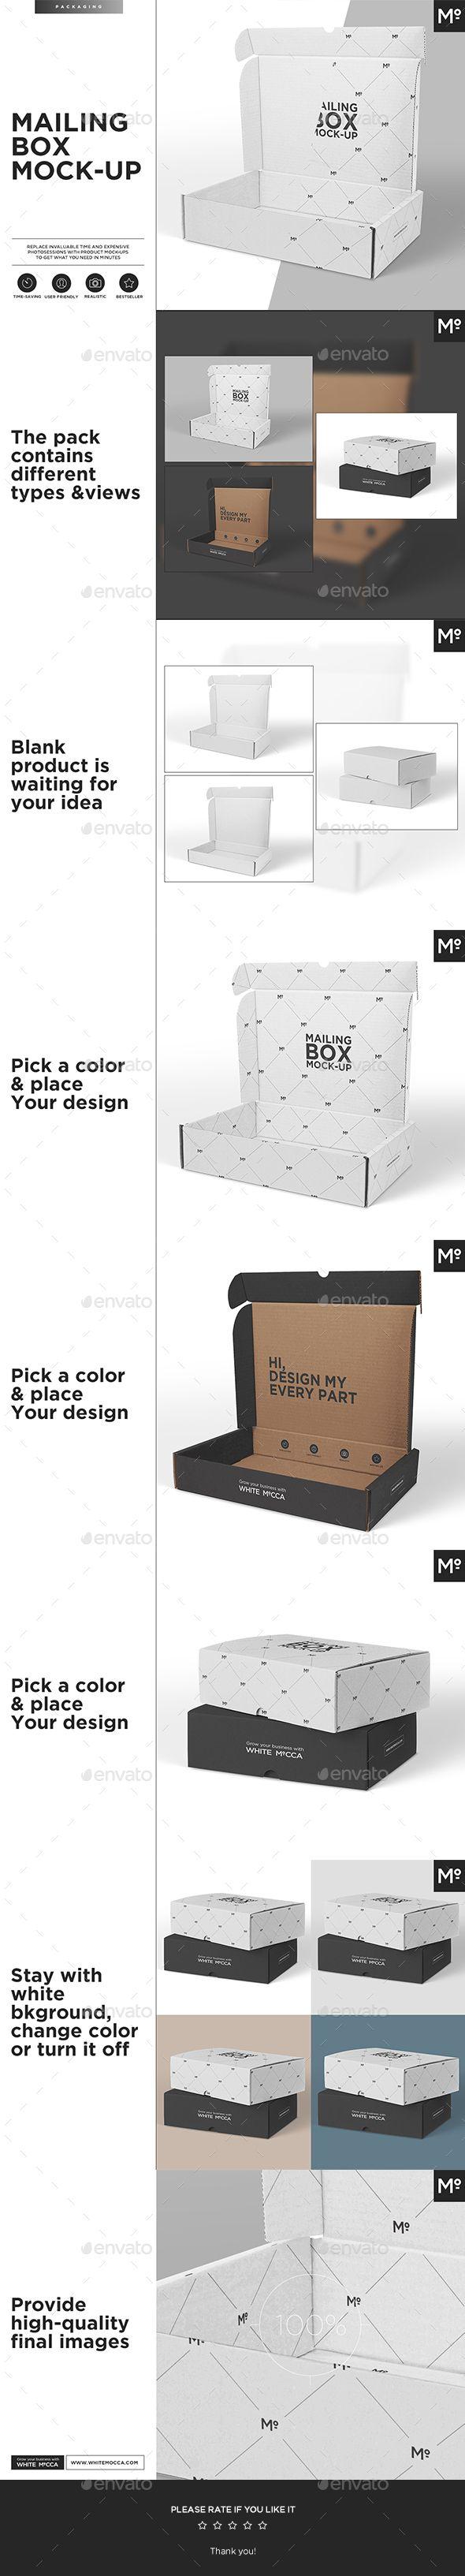 Print Mockup - Mailing Box Mock-up - Print Mockup by Mocca2Go.  #TuesdayThoughts #UserInterface #UIUX #WebElements #TuesdayWisdom #BlackFriday #Vectors #PresentationTemplate#TuesdayFeeling #HappyTuesday  #CyberMonday #Graphic #DesignTemplate #Logo #TuesdayMotivation